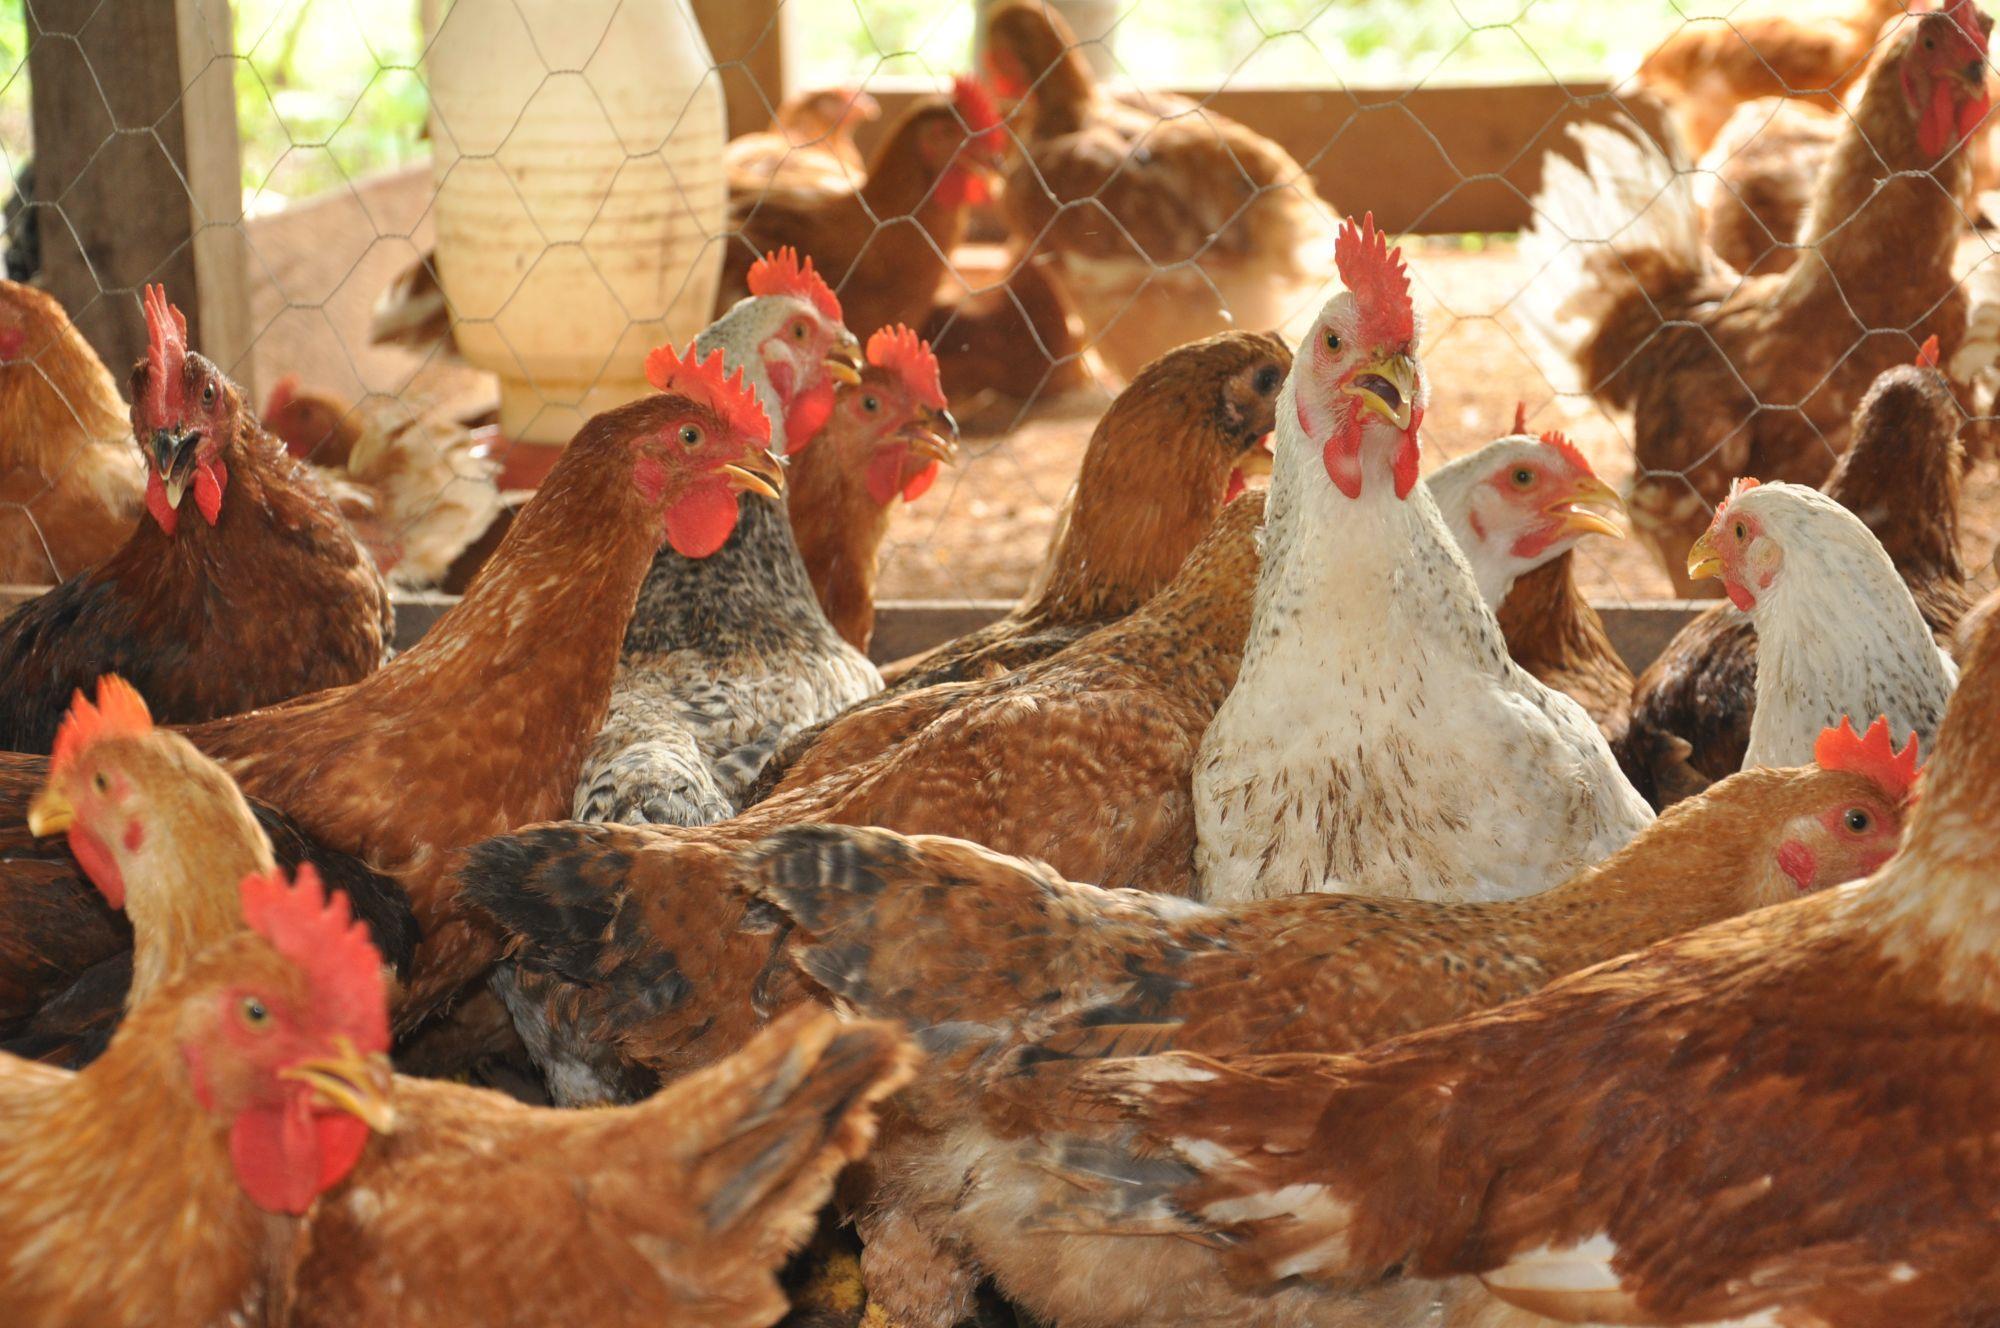 Seagro Tocantins / Fotógrafo Juliano Ribeiro, O setor avícola tocantinense segue ganhando destaques e investimentos, O setor avícola tocantinense segue ganhando destaques e investimentos